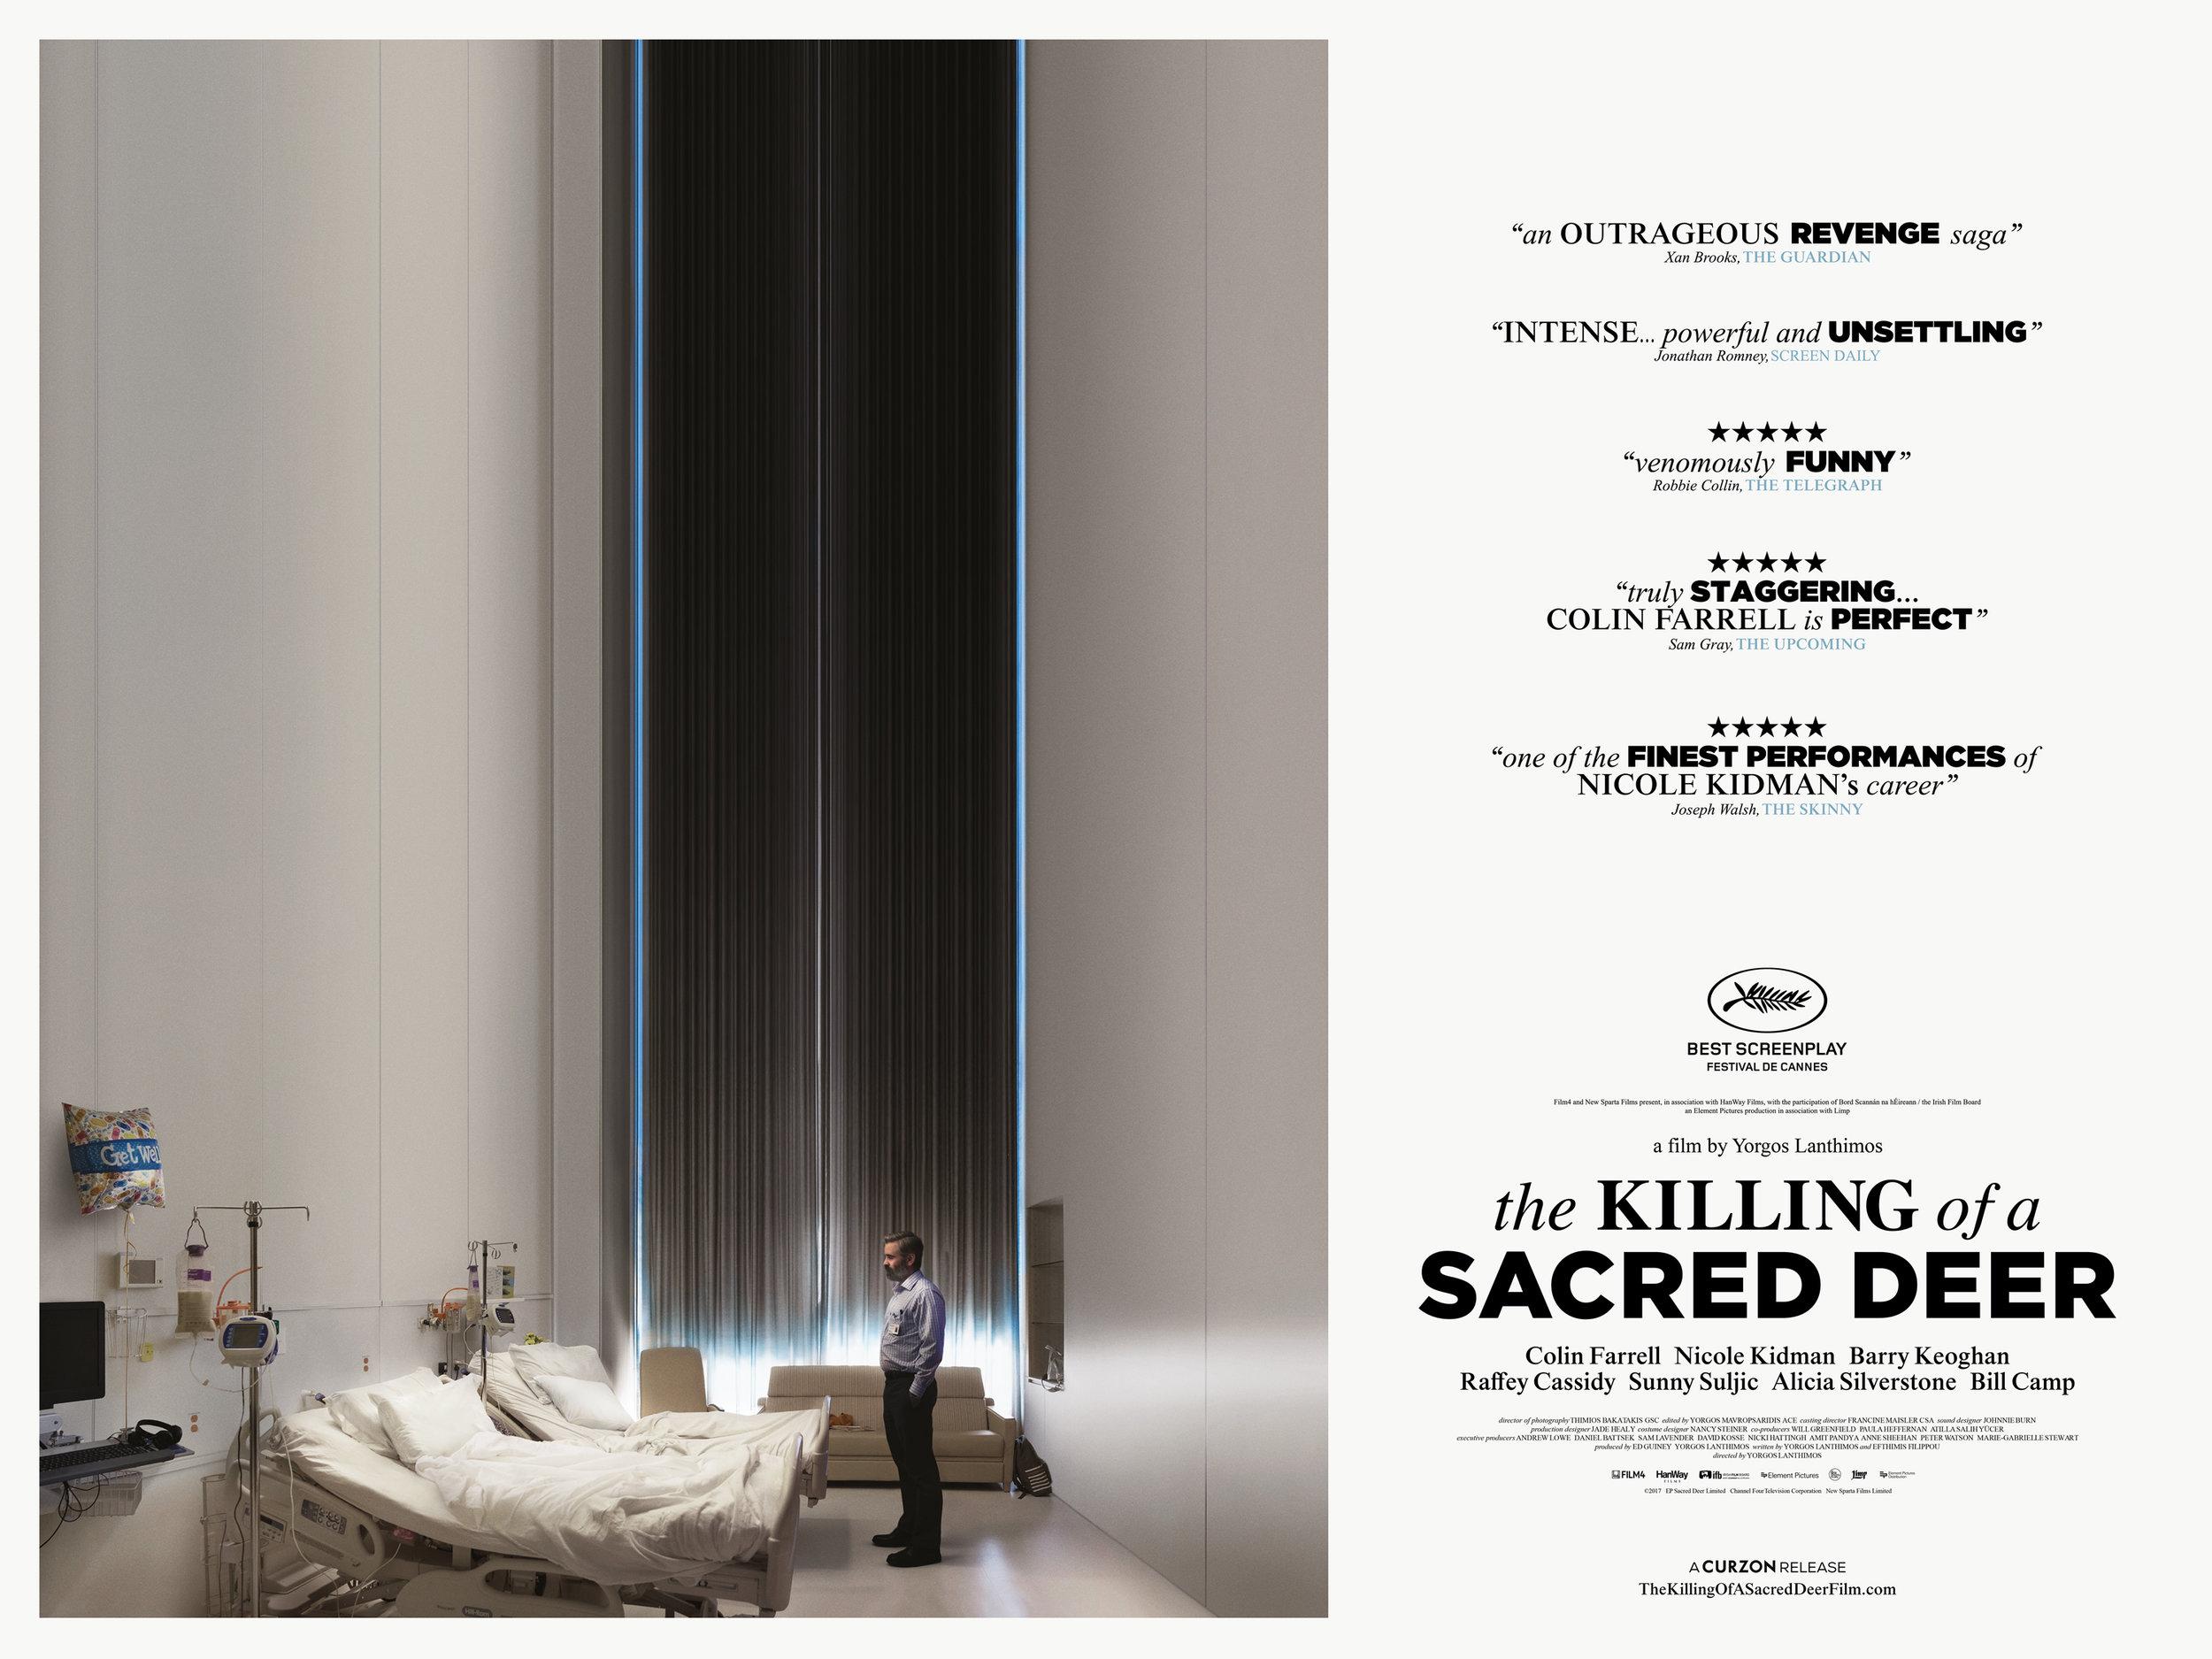 the-killing-of-a-sacred-deer-poster.jpg